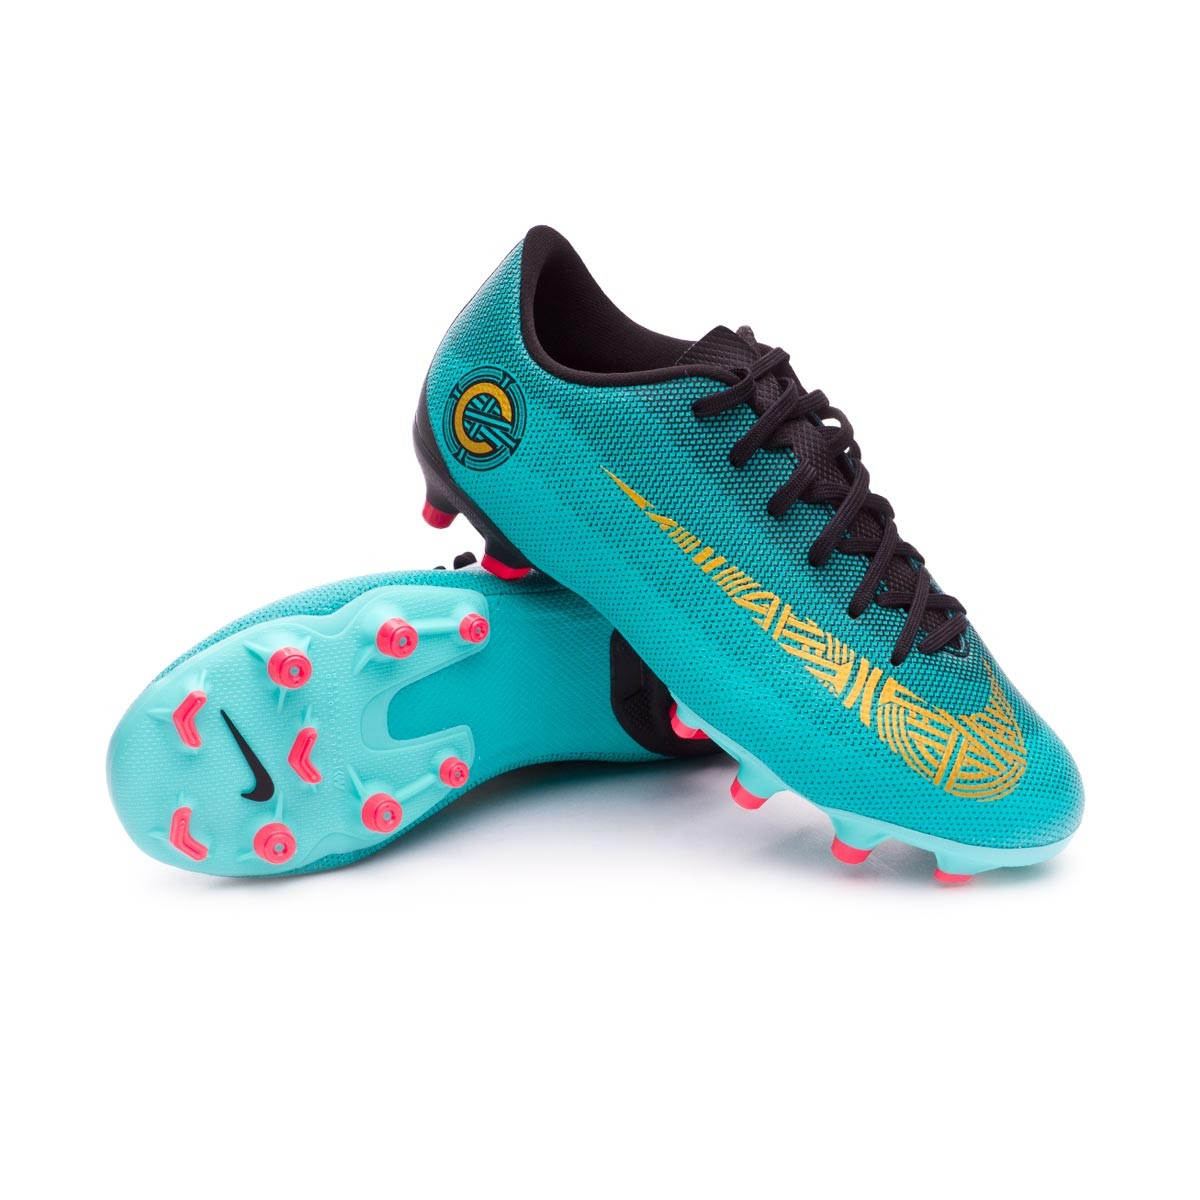 pretty nice 0af2e 08fc6 Nike Kids Mercurial Vapor XII Academy GS CR7 MG Boot